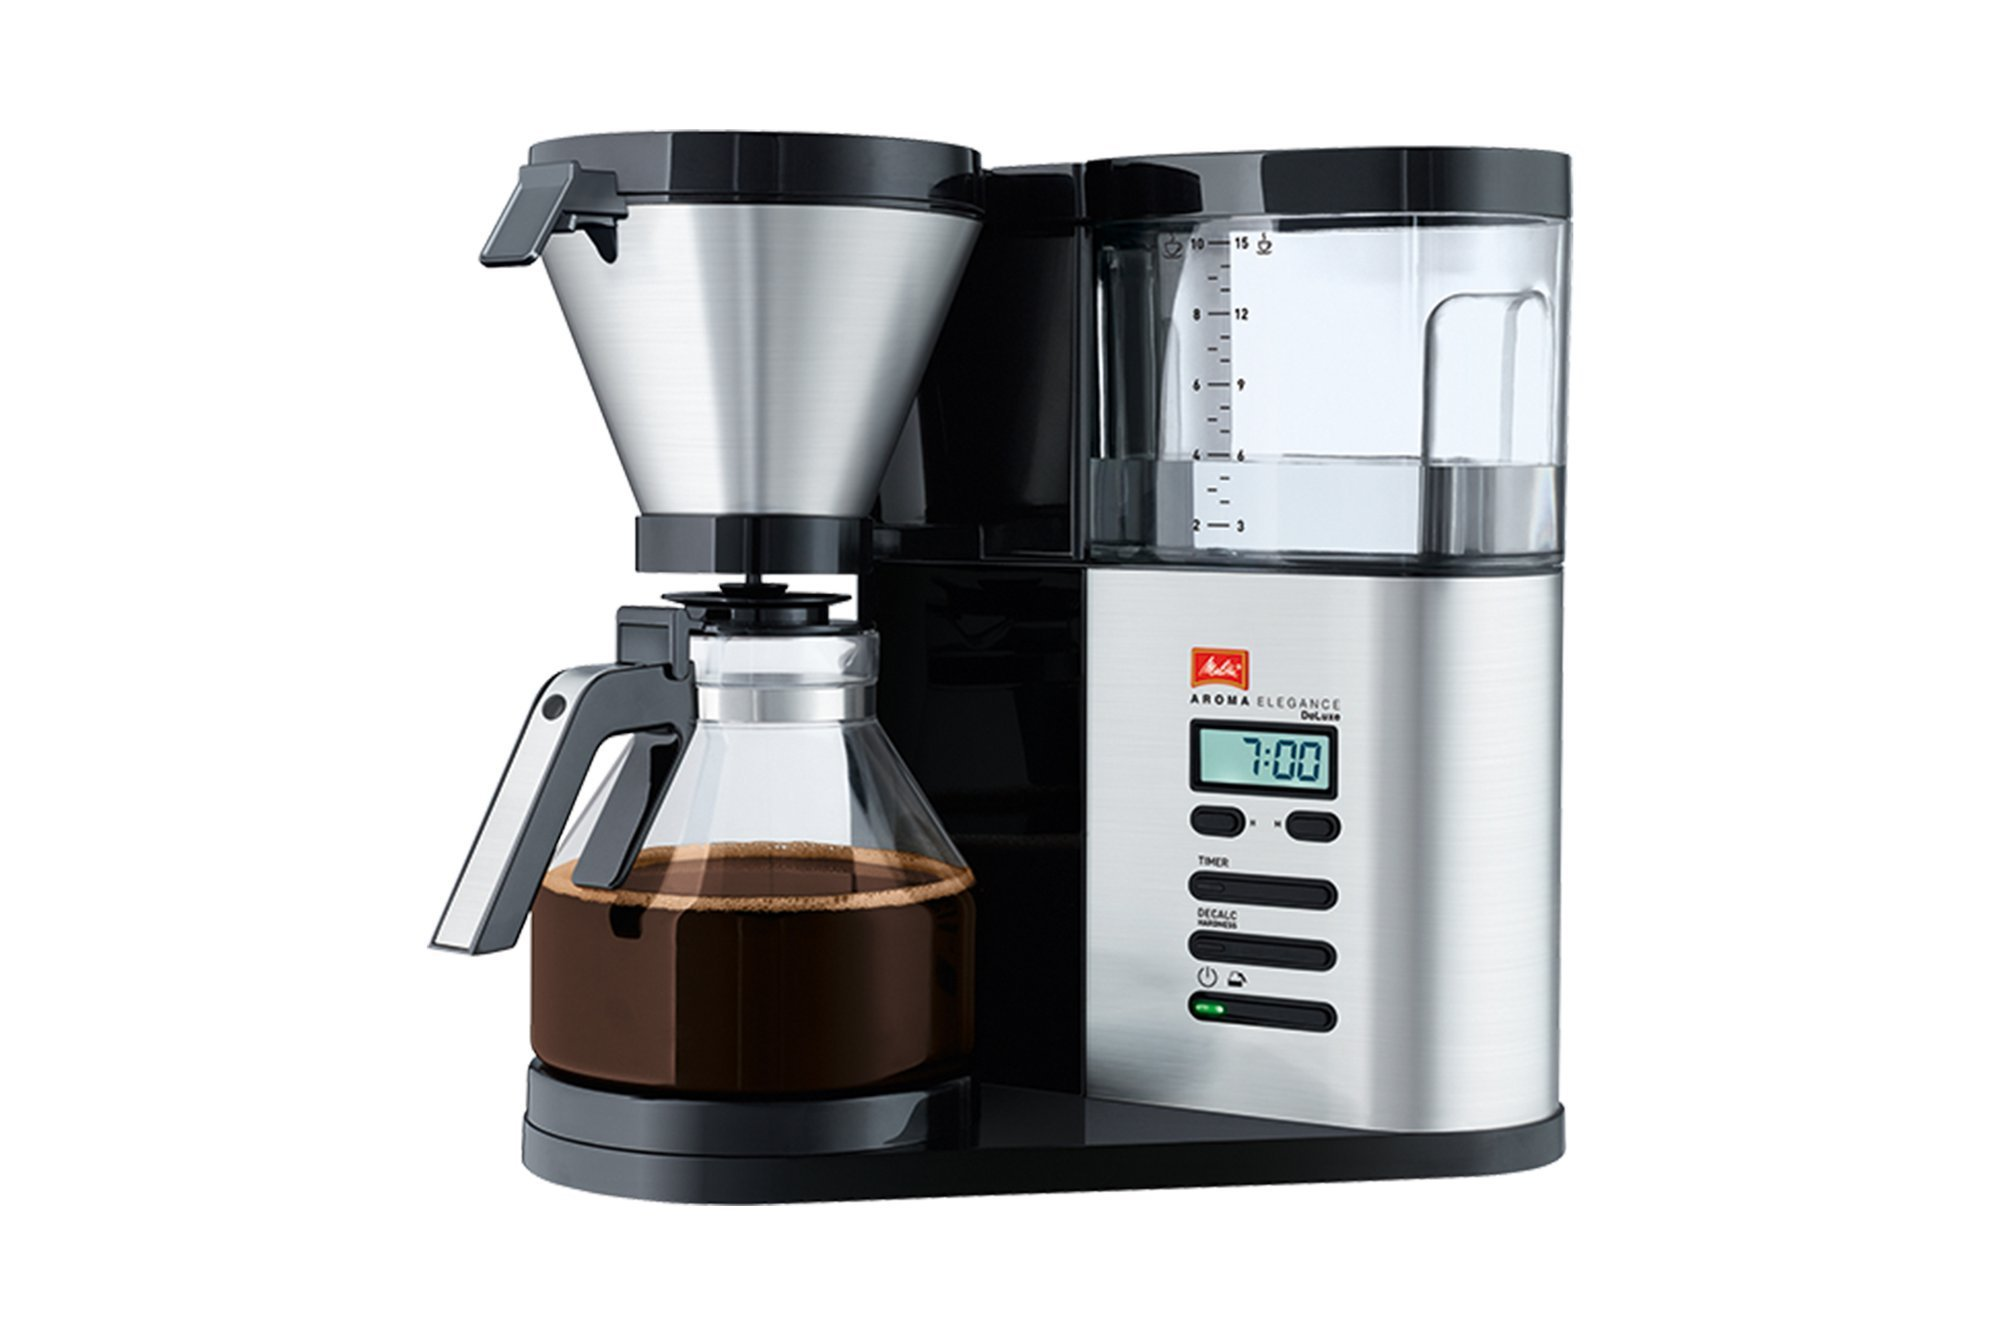 Filter coffee machine Melitta AromaElegance Deluxe 1012-03 1.2l 1520W